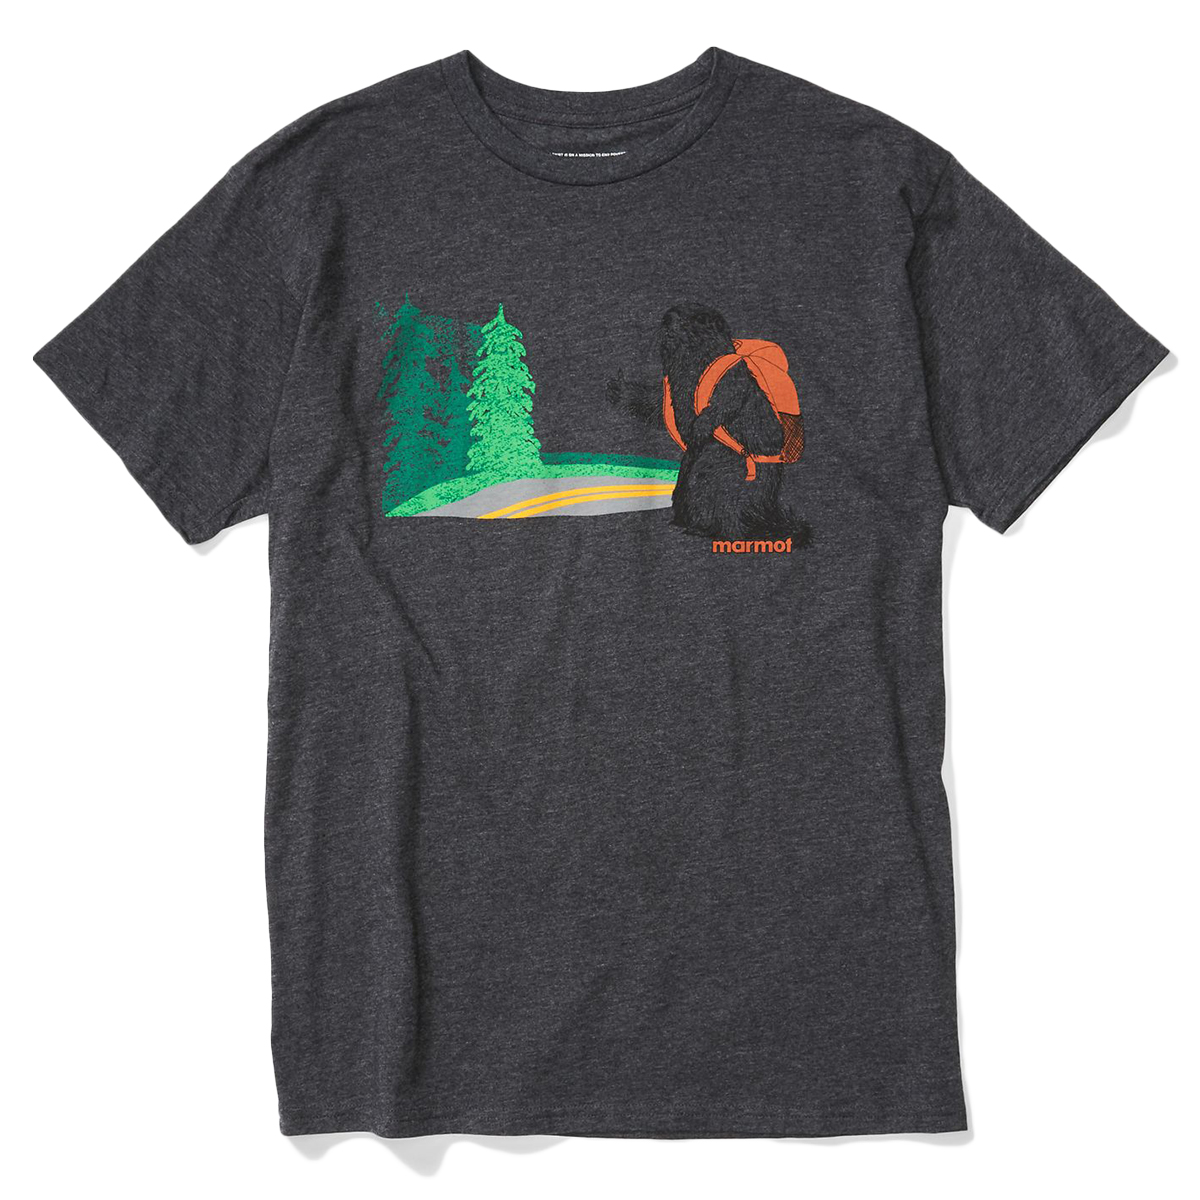 Marmot Men's Trek Short-Sleeve Tee - Black, M